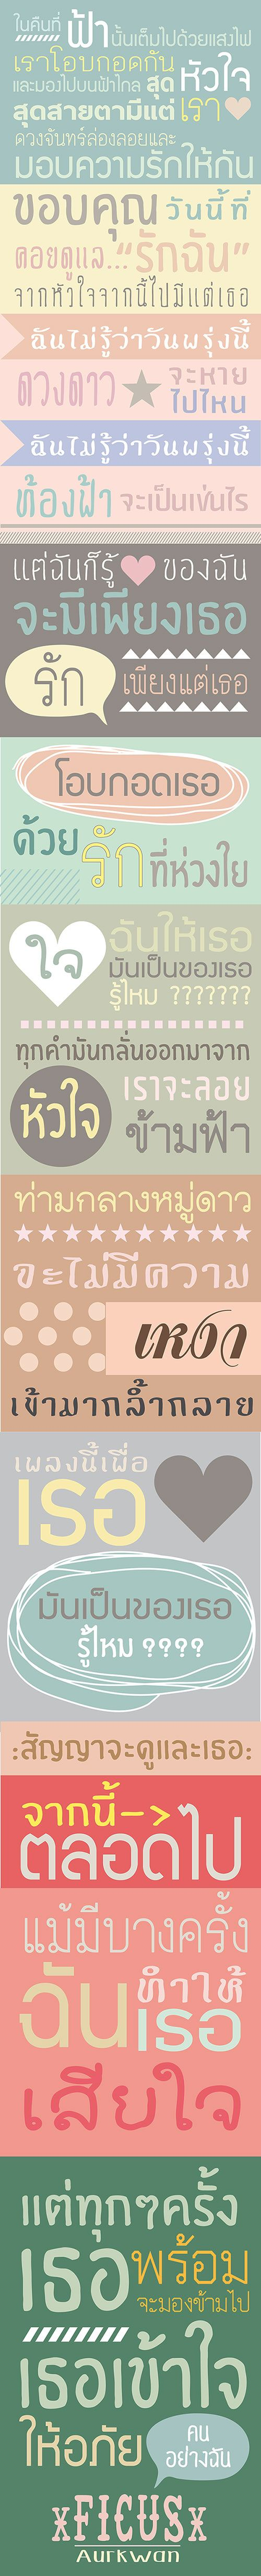 Font Thai  เนื้อเพลง ลูกอม วัชราวลี #WhatChaRaWaLee #font